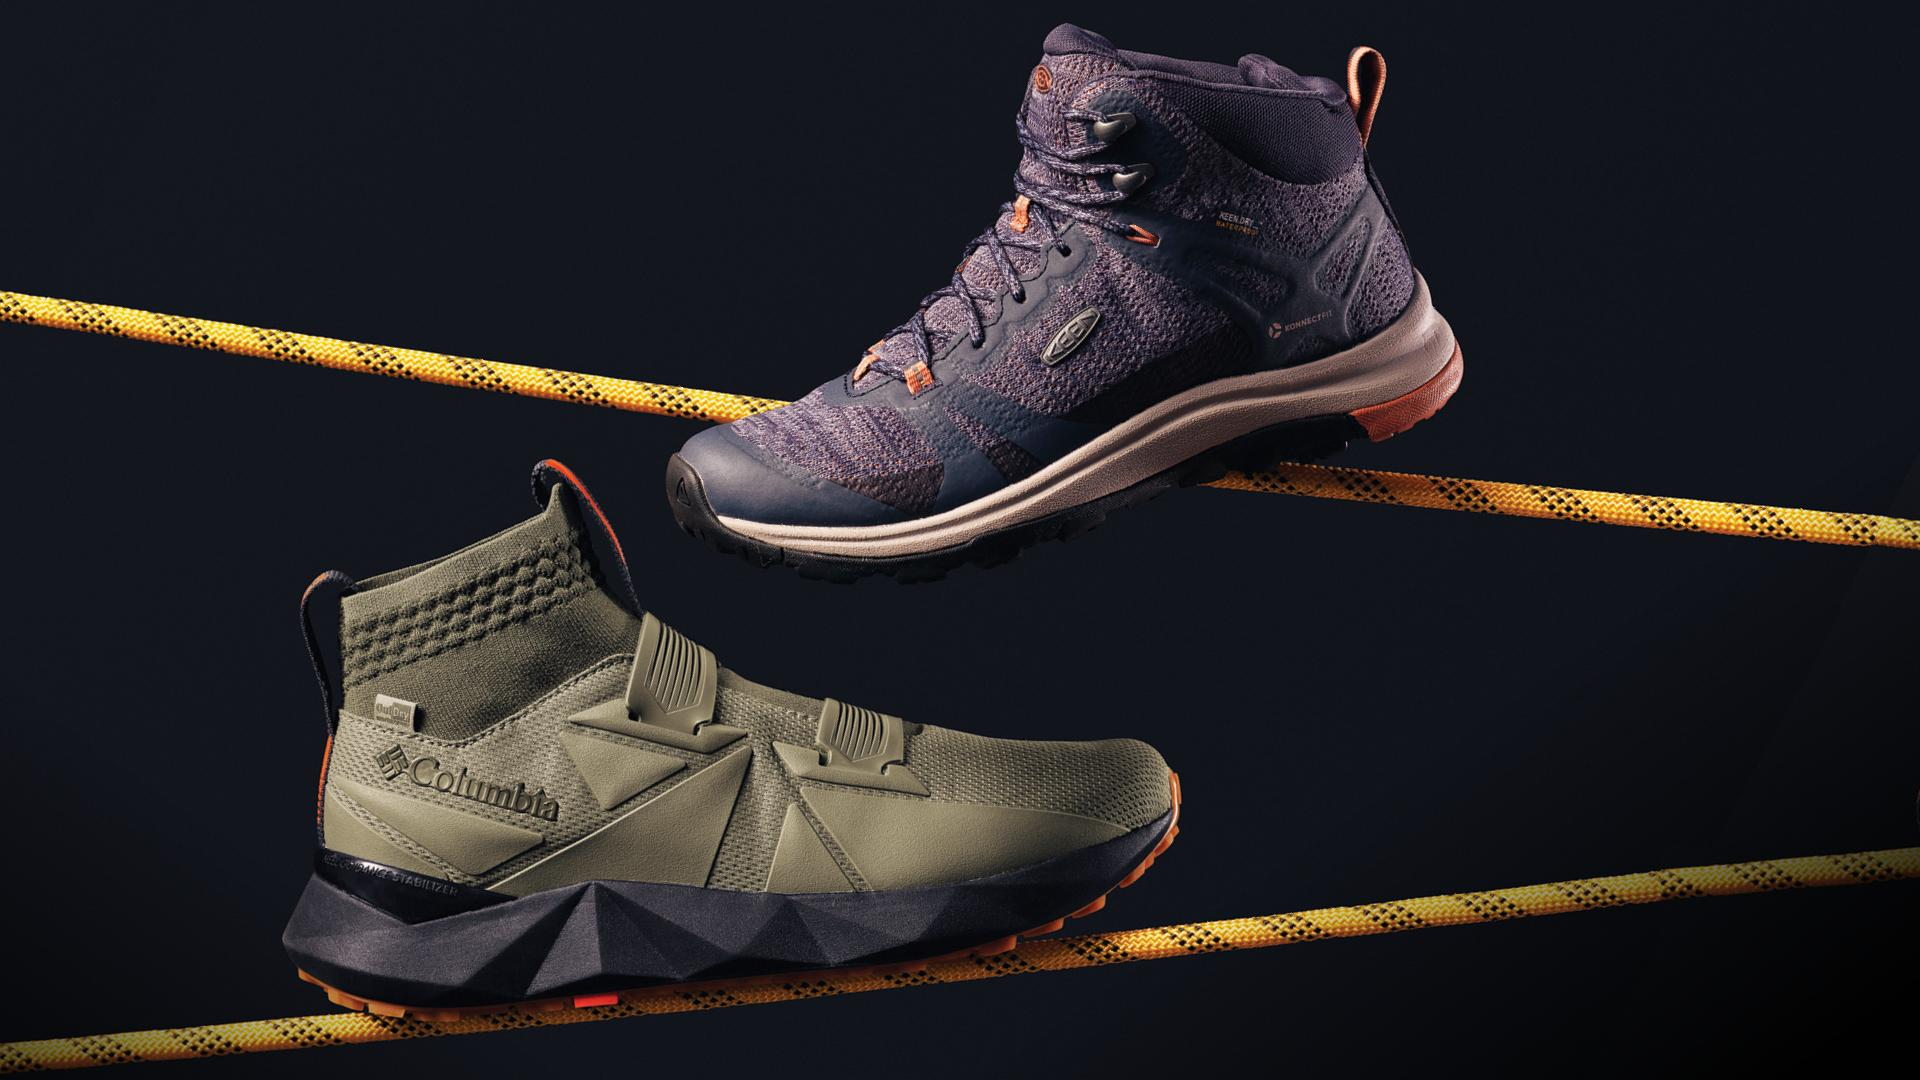 hiking essentials for fall 2020 | Columbia Facet boot, Keen Terradora II boot